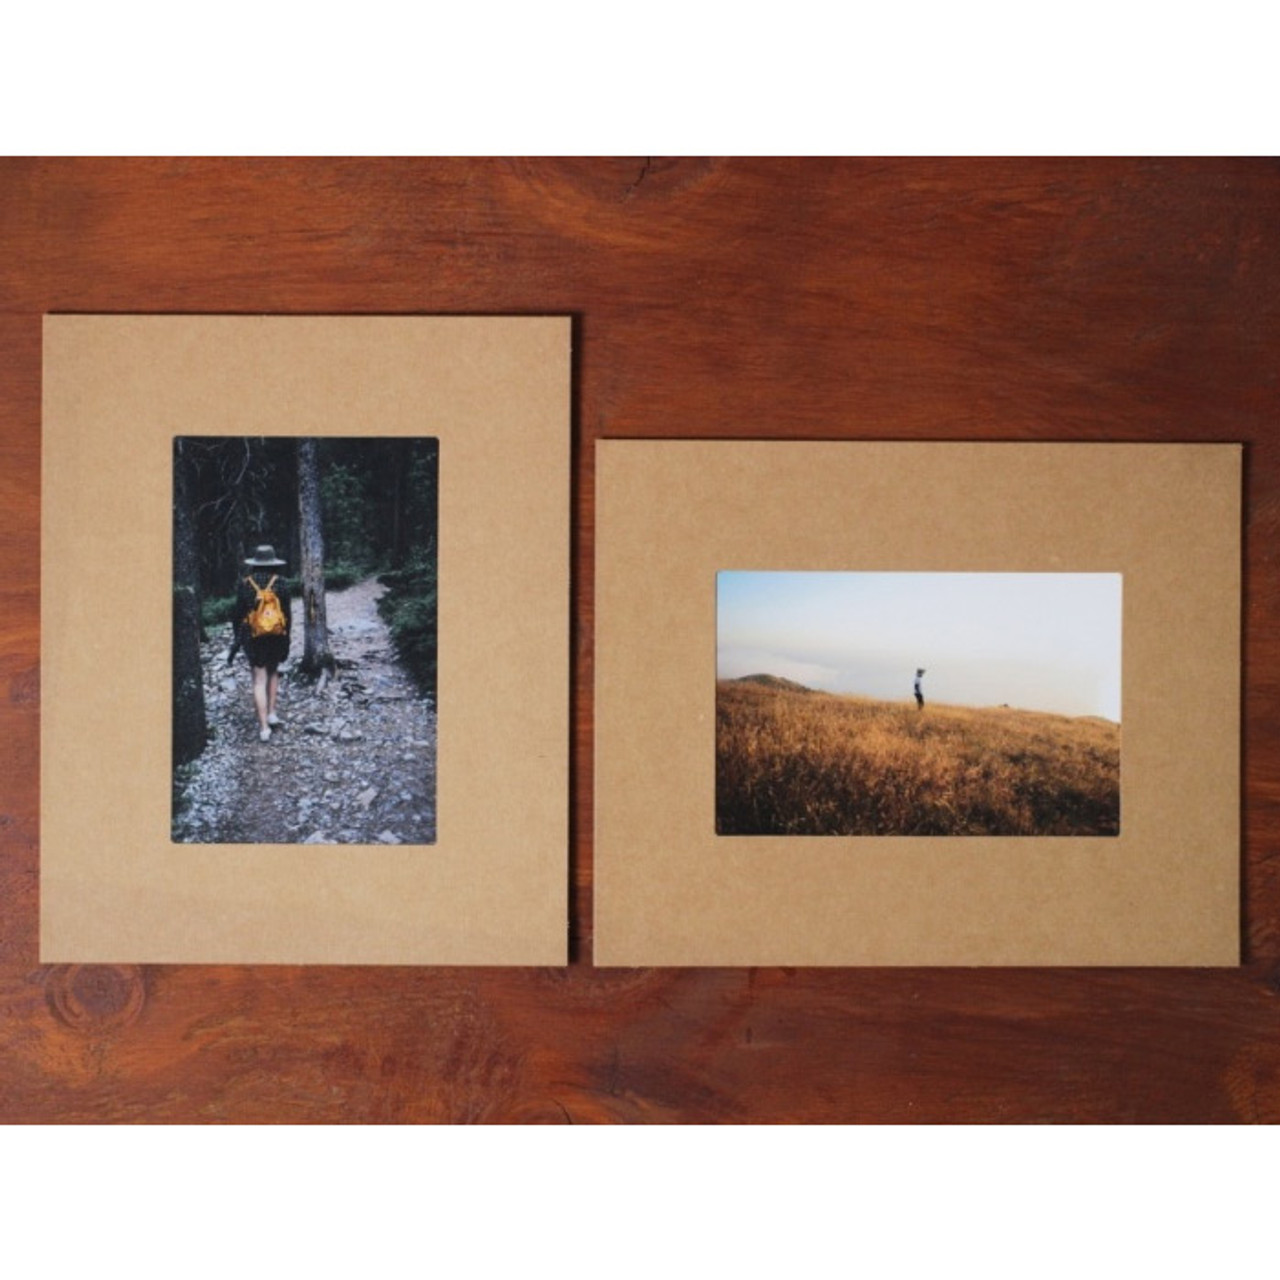 moods views 4x6 premium kraft paper photo frame set. Black Bedroom Furniture Sets. Home Design Ideas